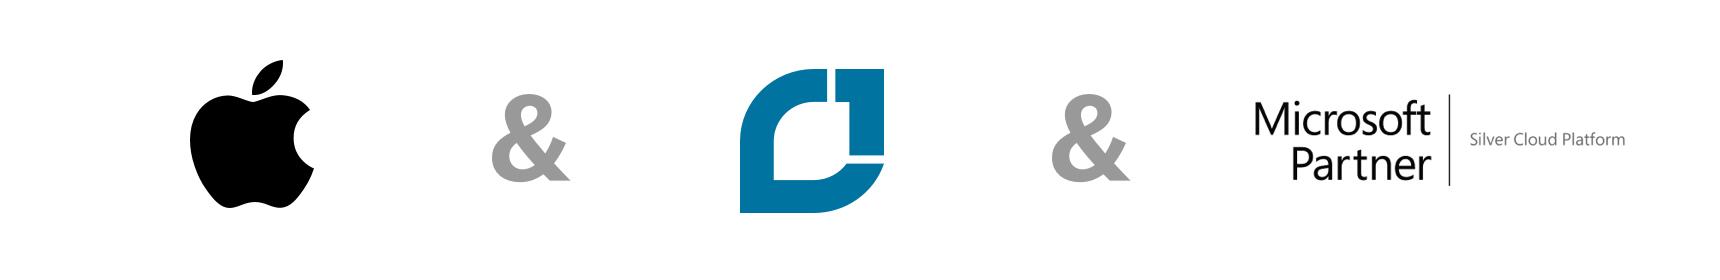 ChaiOne-Partnerships-v4